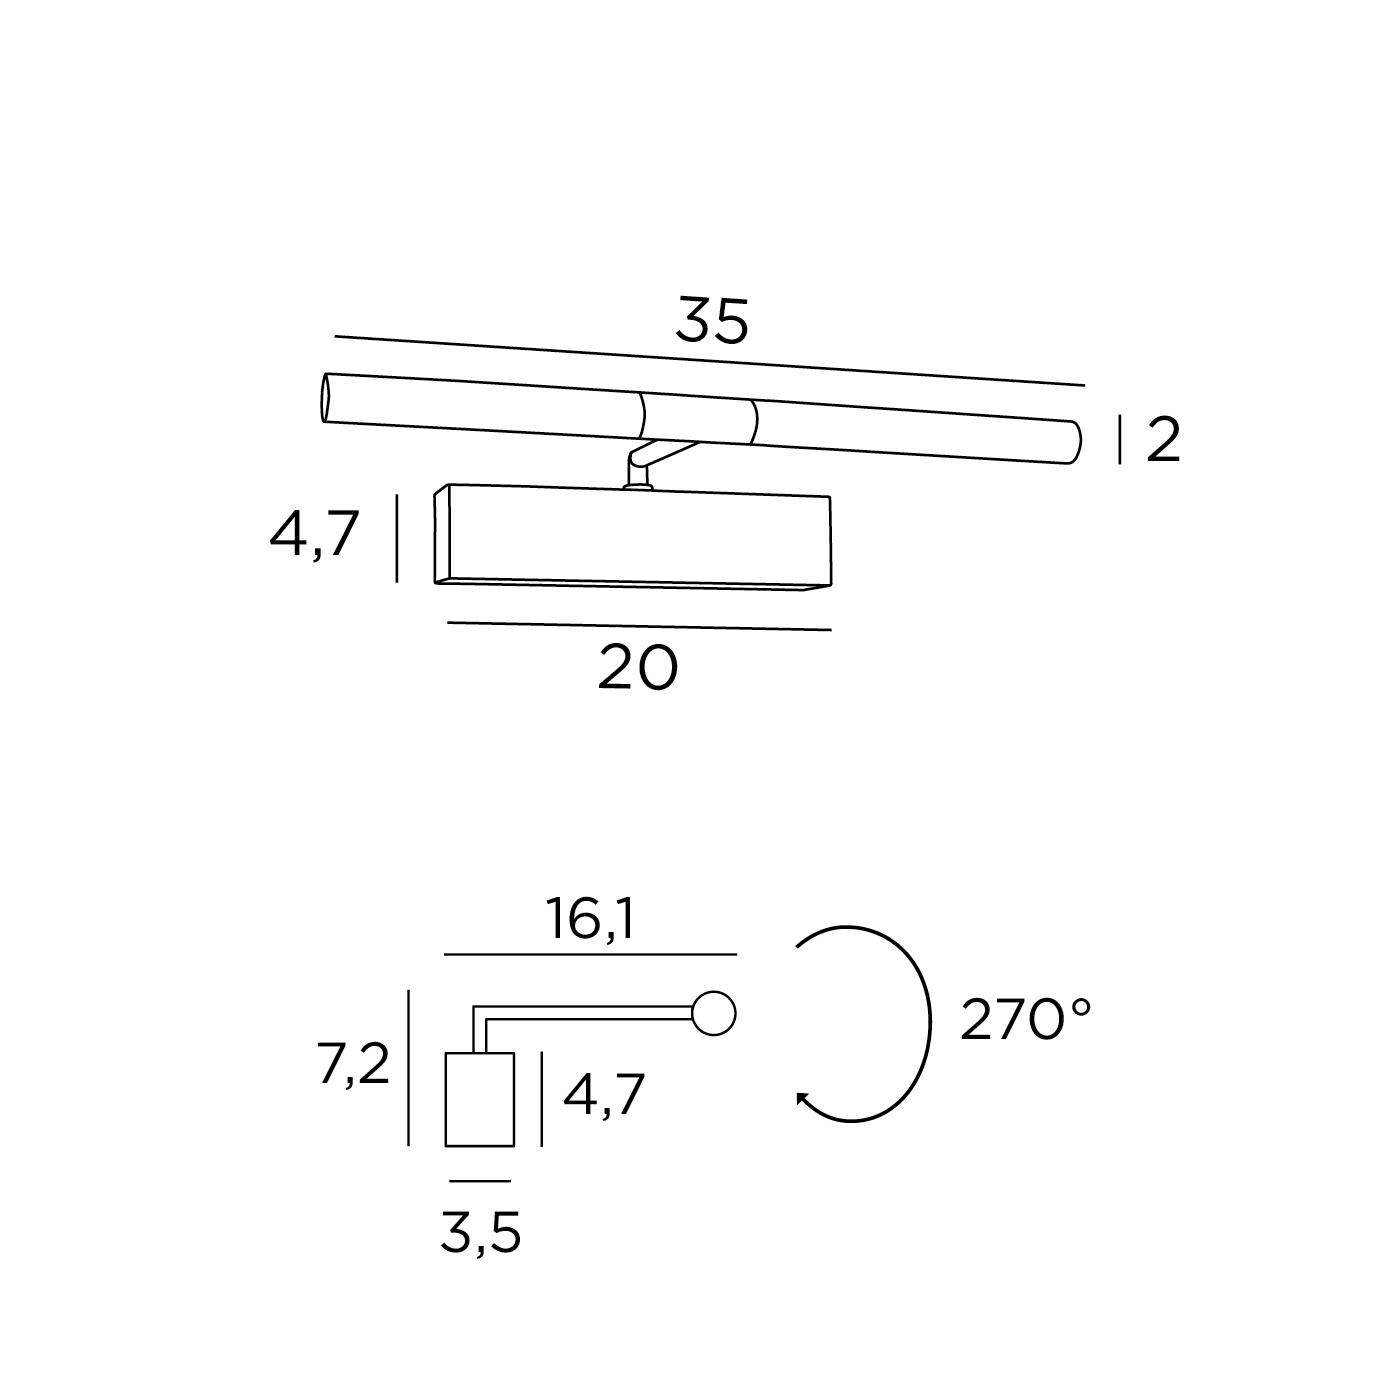 meidoum 35 davidts ligthingA Diagram Of 35 Led Light A #15